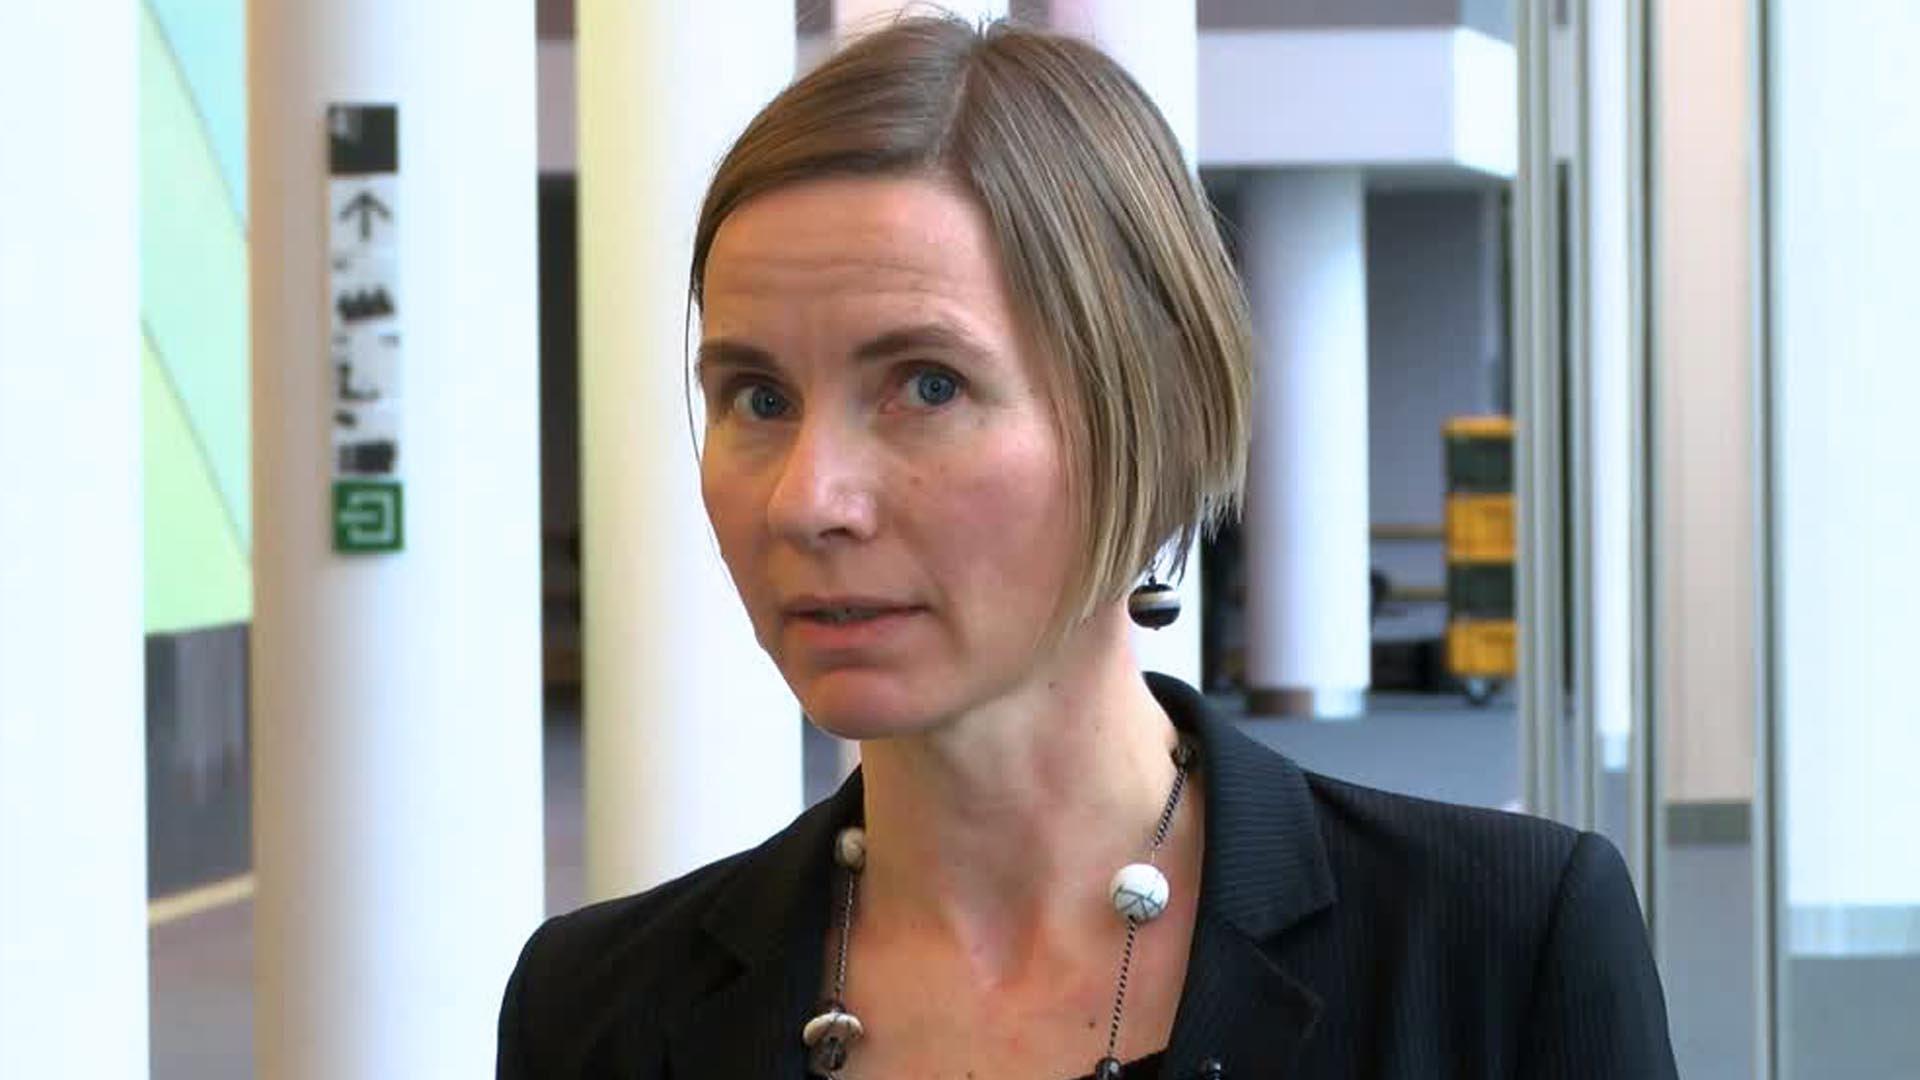 Franziska Achterberg, portavoce di Greenpeace